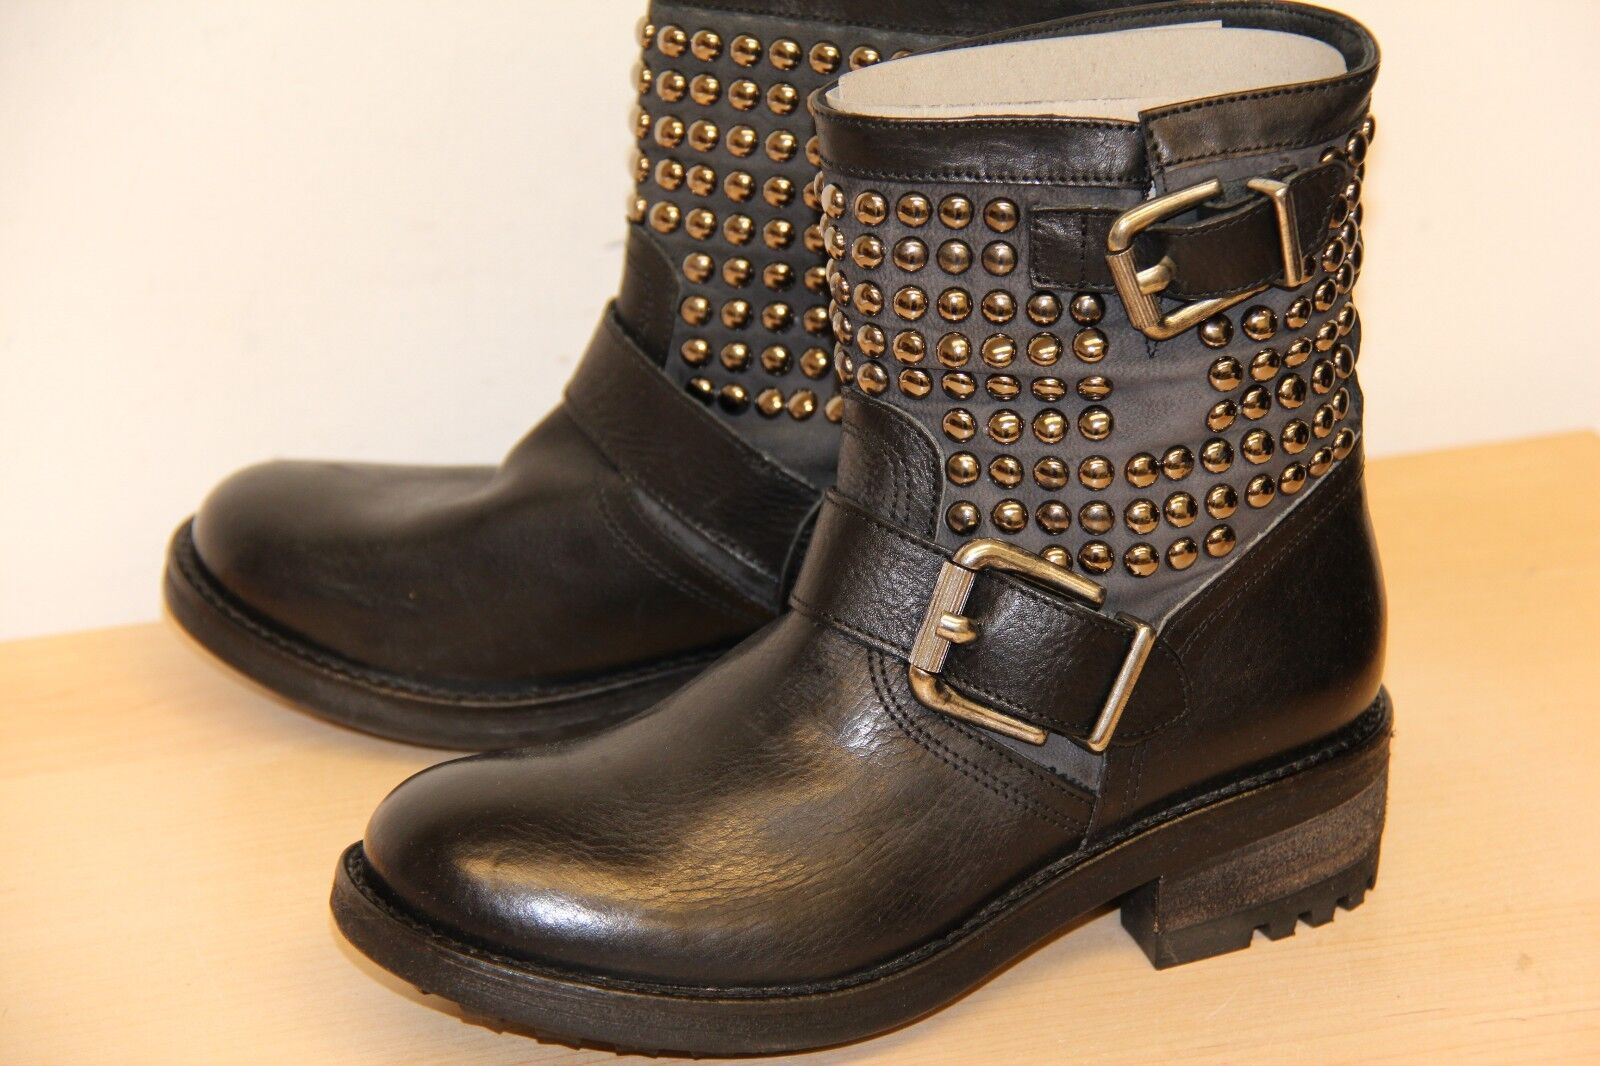 NIB Mally DUSTY Studded Vaccheta Leather Ankle Motorcycle Boots Sz 36 6 M Black